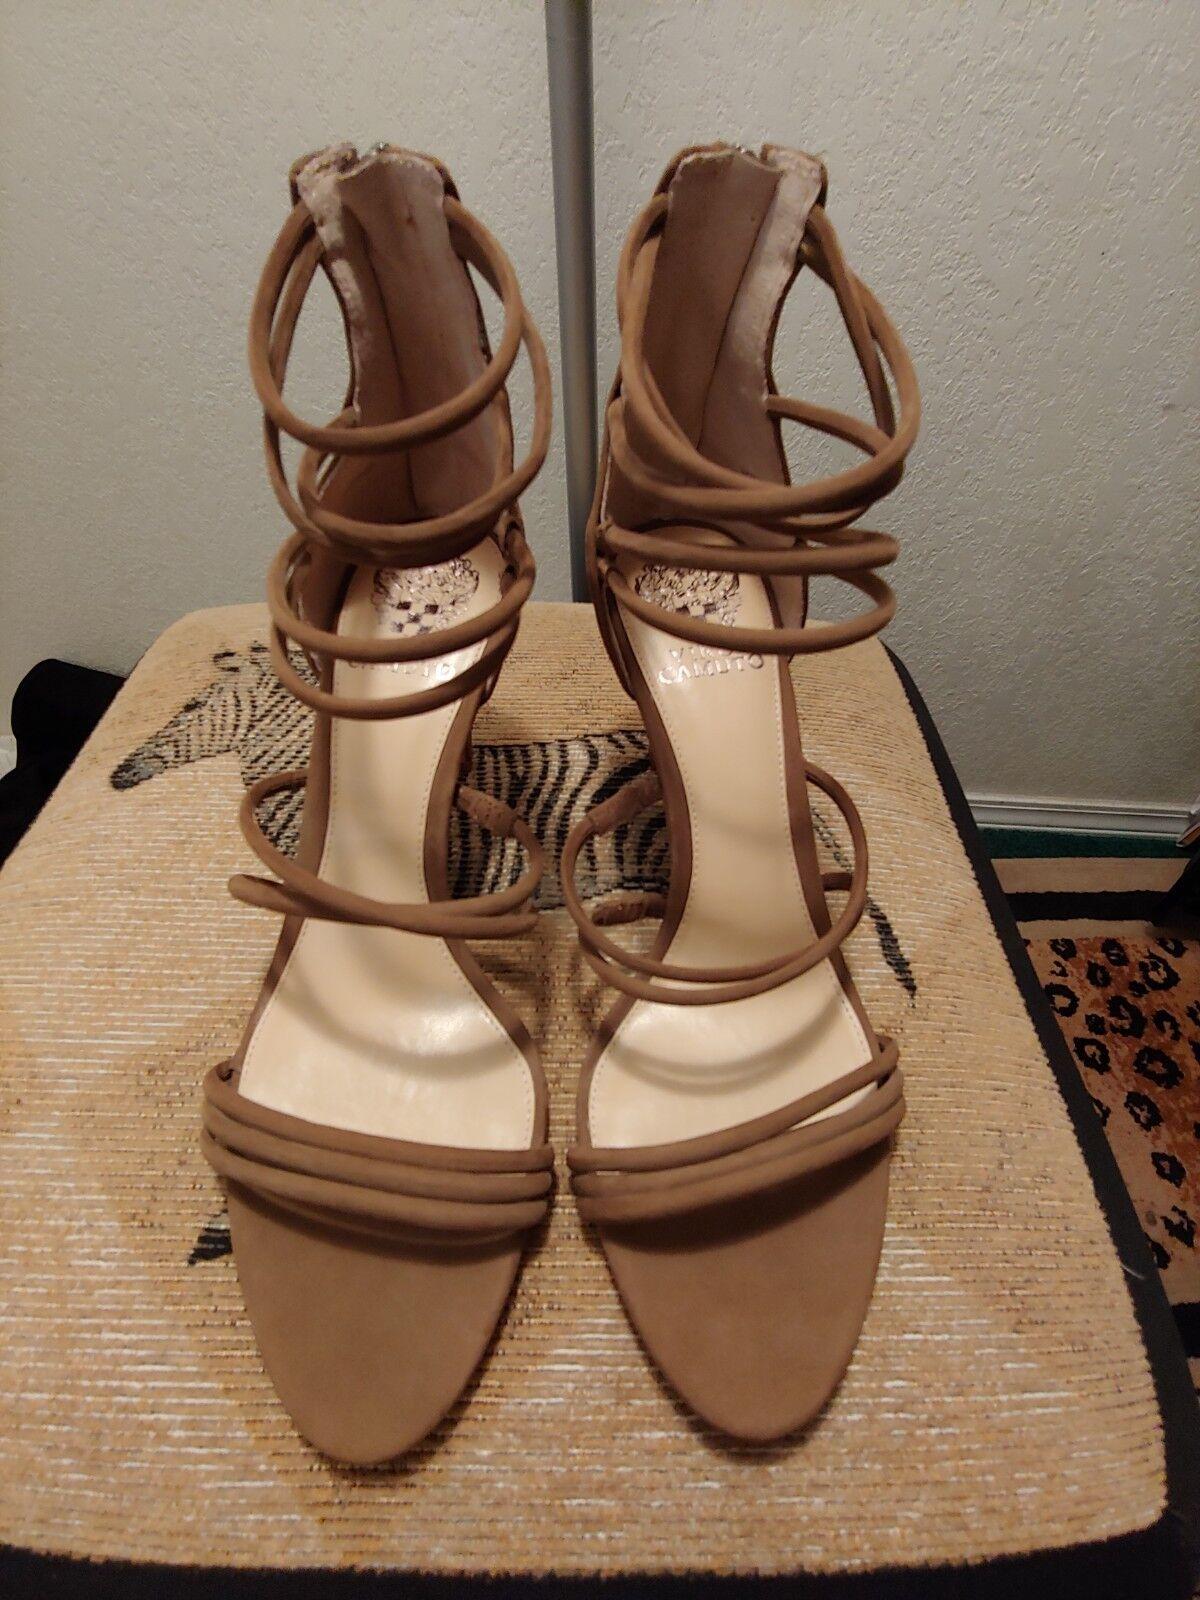 Vince Camuto Cadela Strappy Sandal Size 10 10 10 (NWOB) b6621f